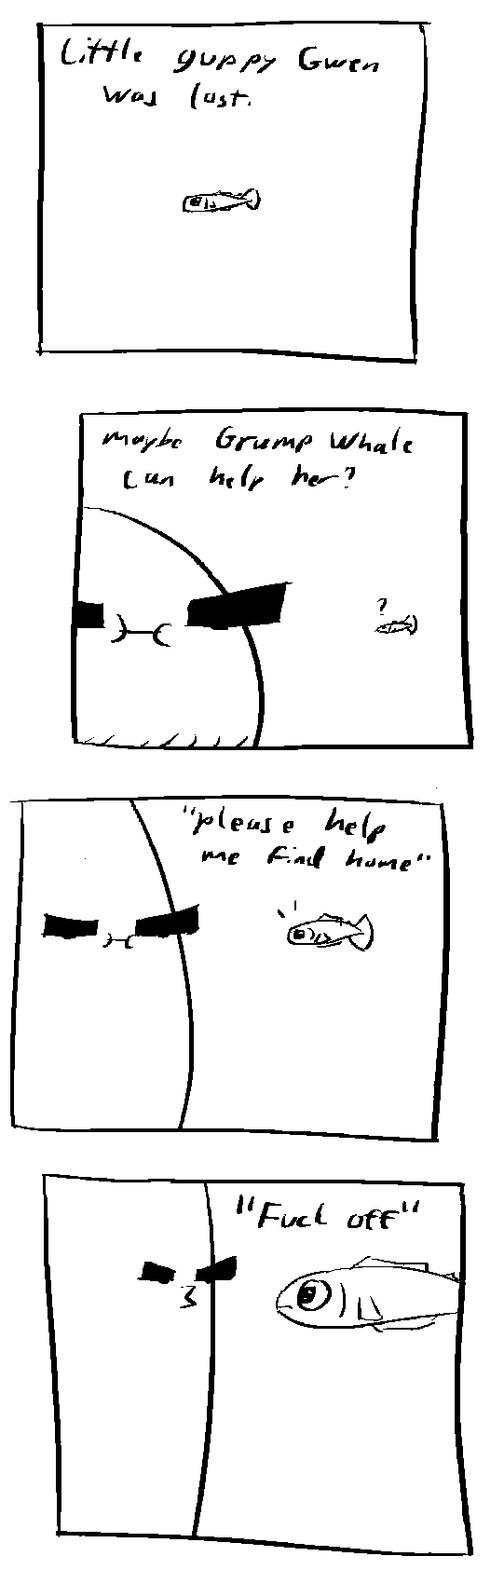 grump whale is helpful by shook12